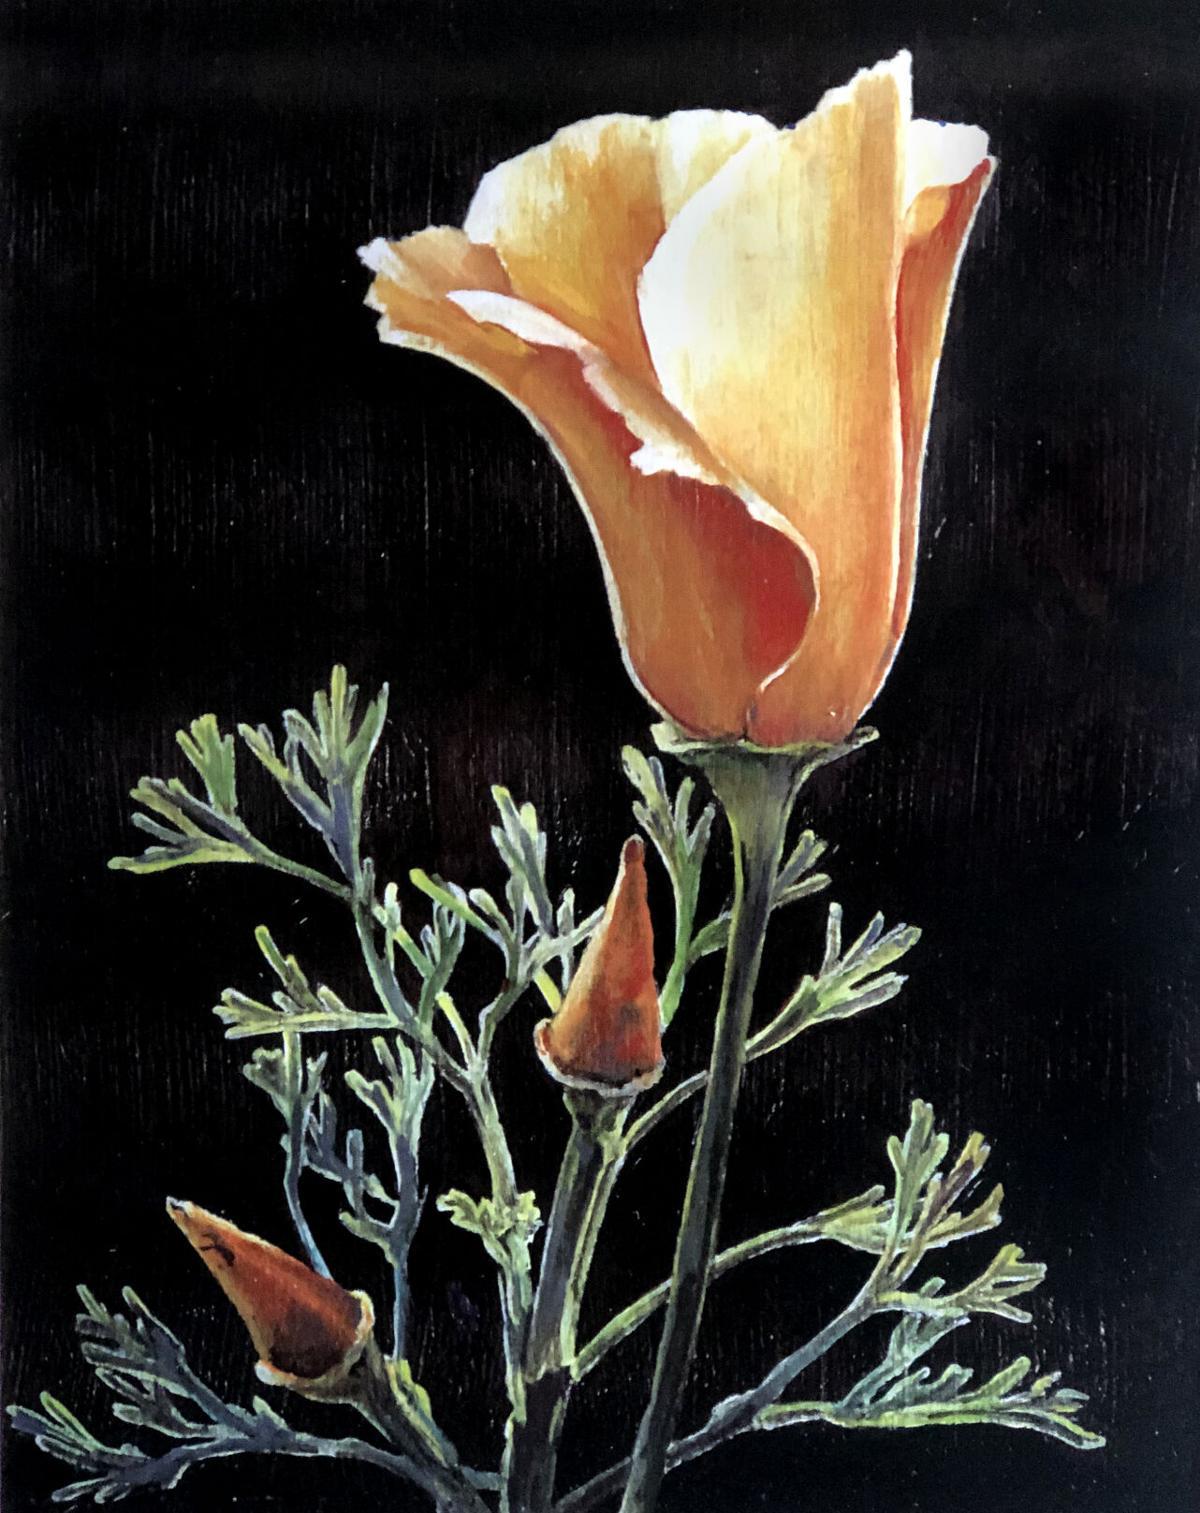 Pen in Hand #1725 - California Poppies 1.jpg